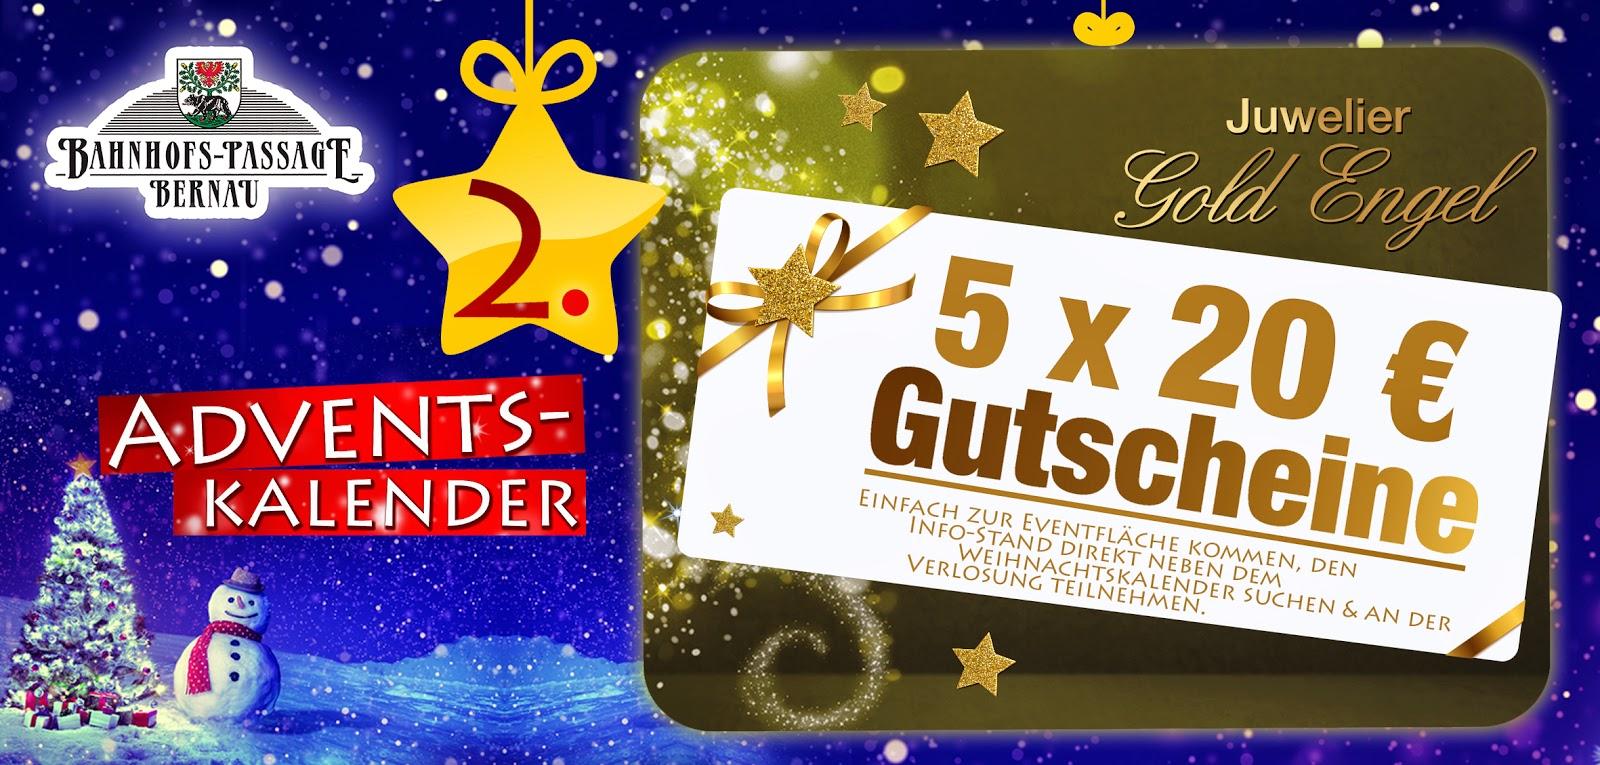 FB Banner 2Dez Goldengel